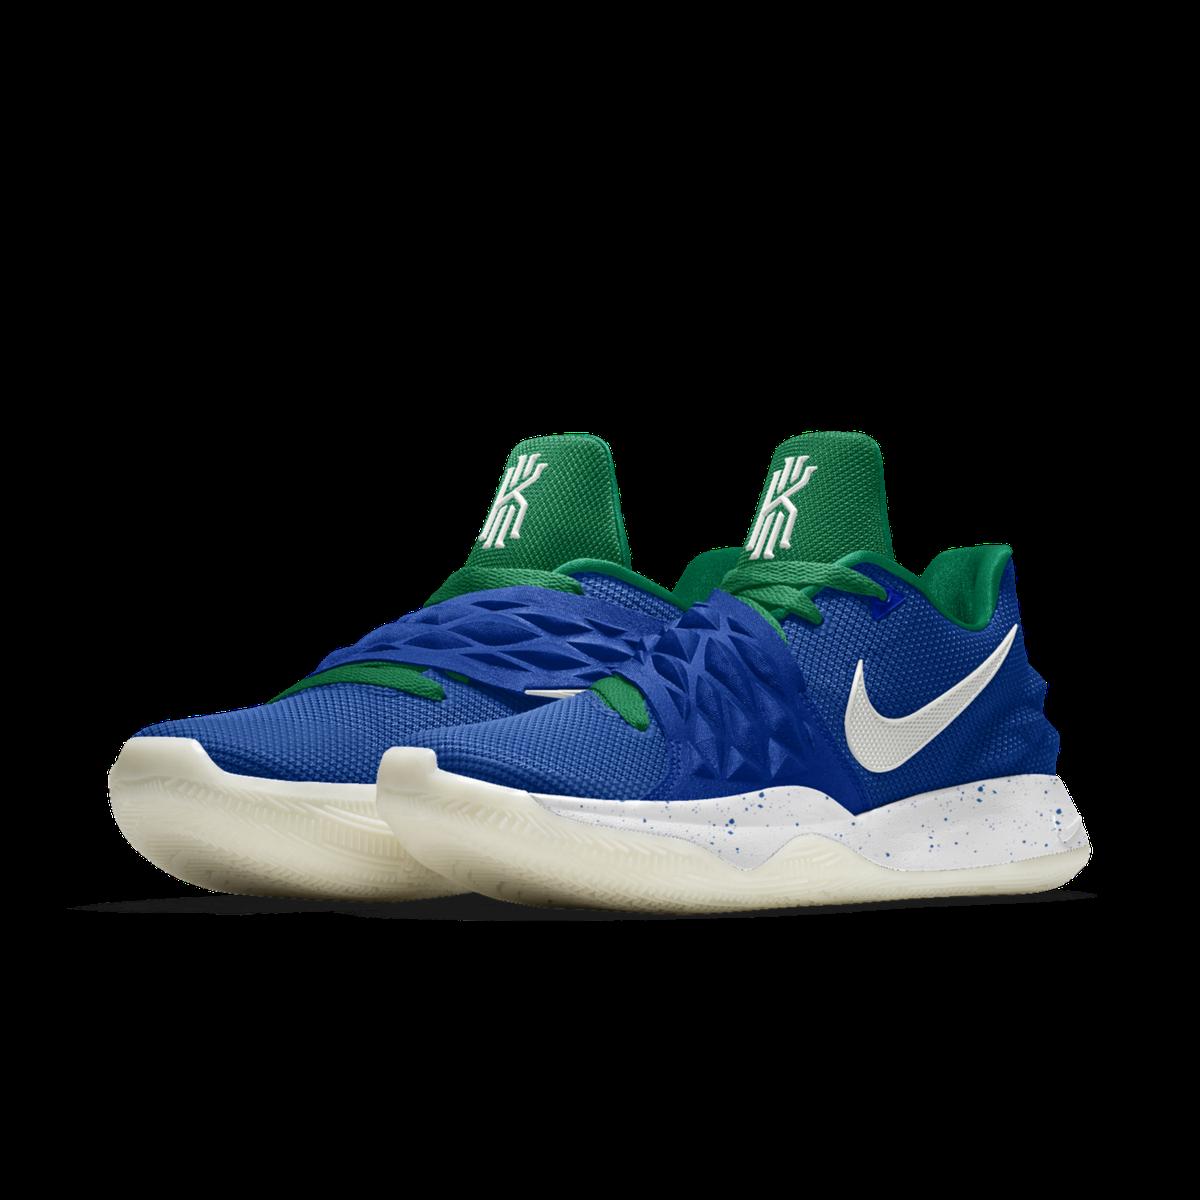 online retailer f0b3e 205c2 Jayson Tatum, Kyle Kuzma among stars to create Nike NBA ...